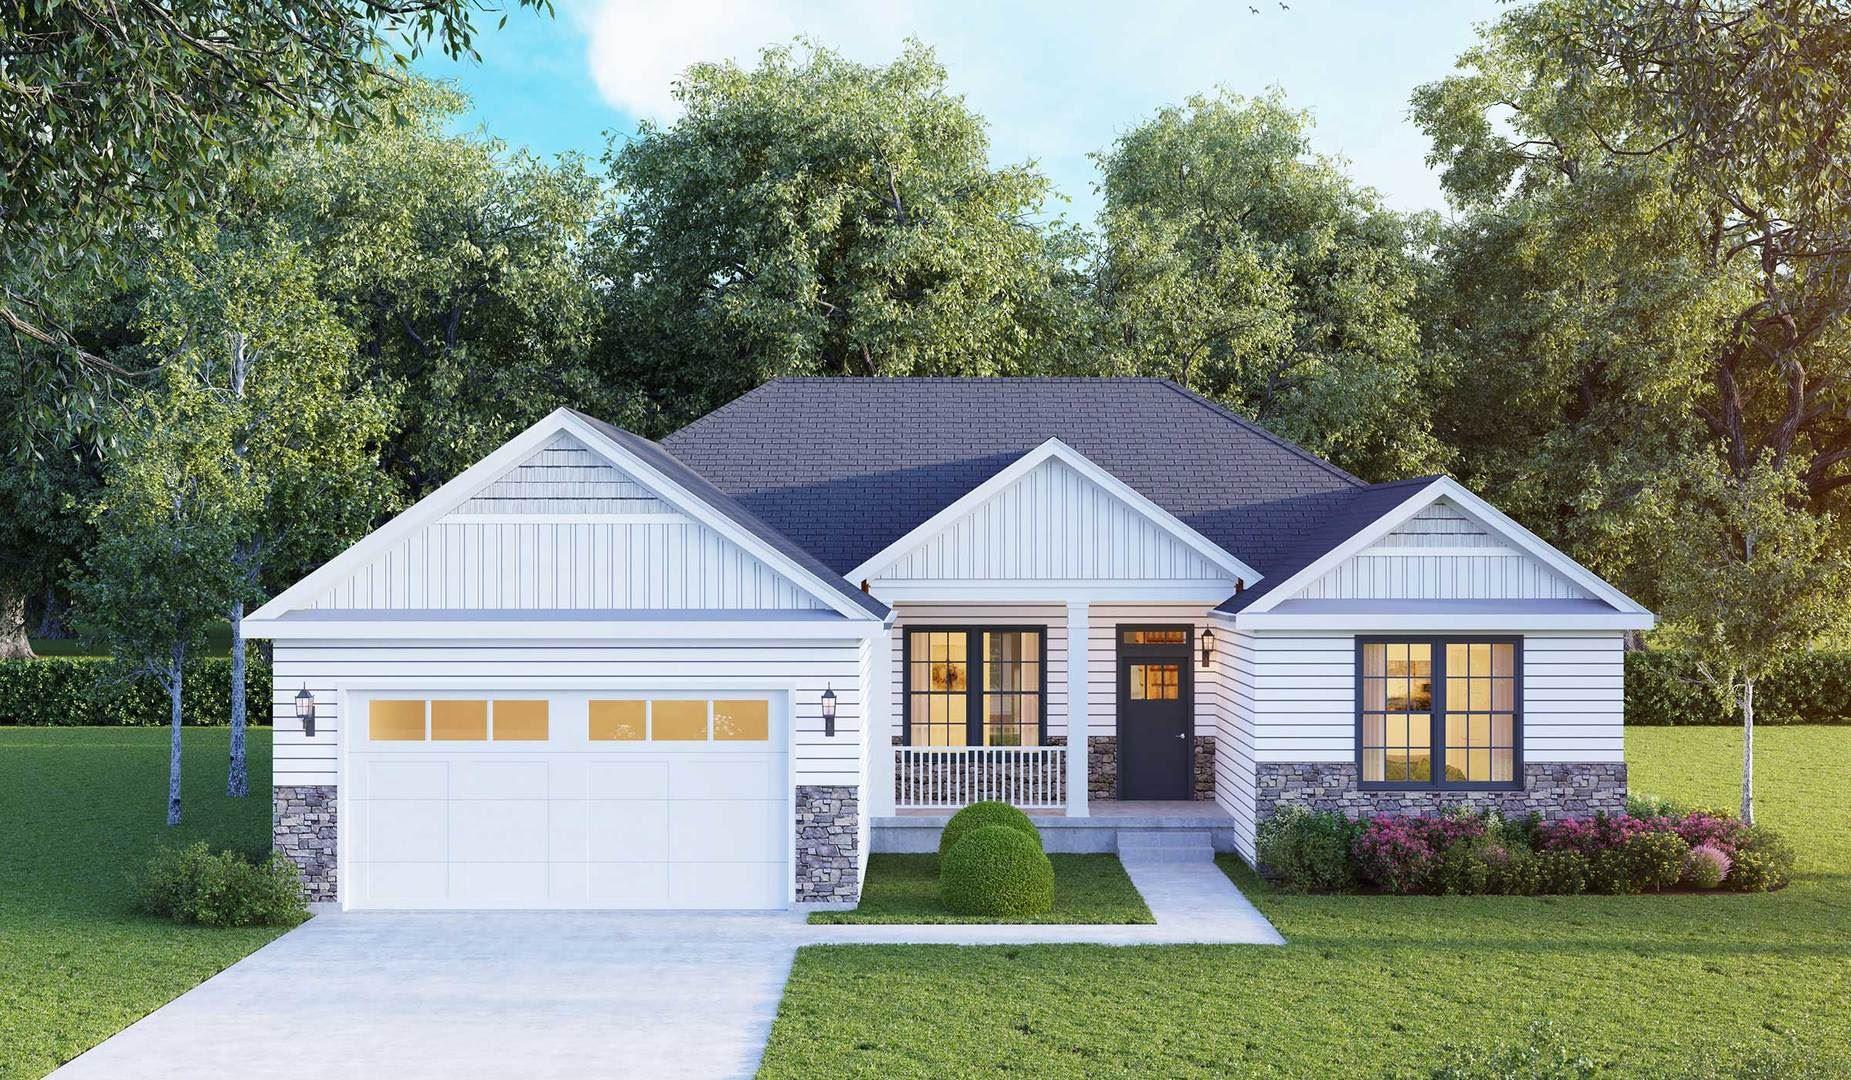 1610 Peyton Terrace, Shorewood, IL 60404 - #: 11199891